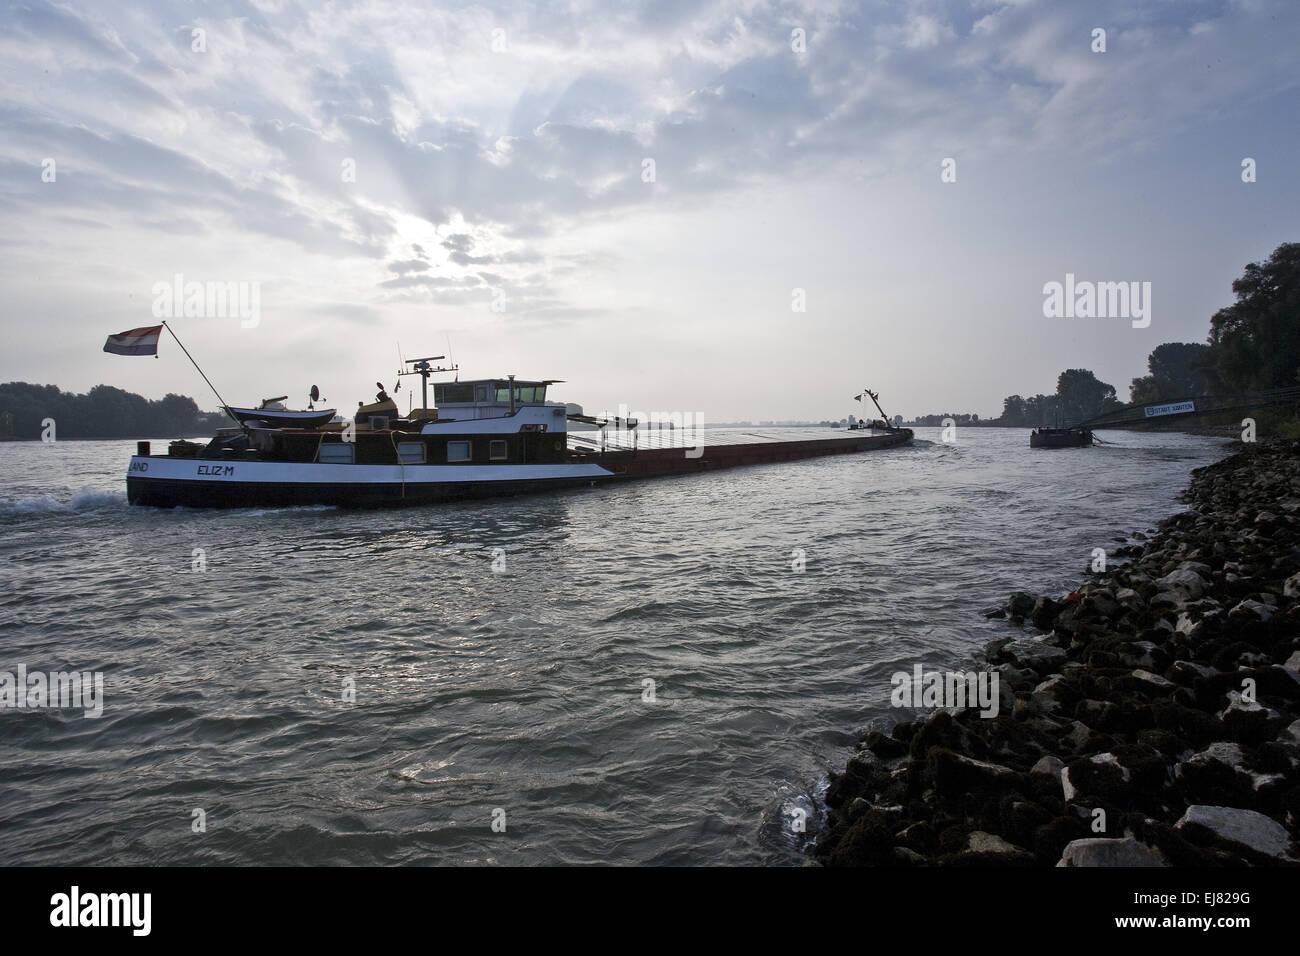 Cargo ship on the Rhein, Xanten, Germany - Stock Image